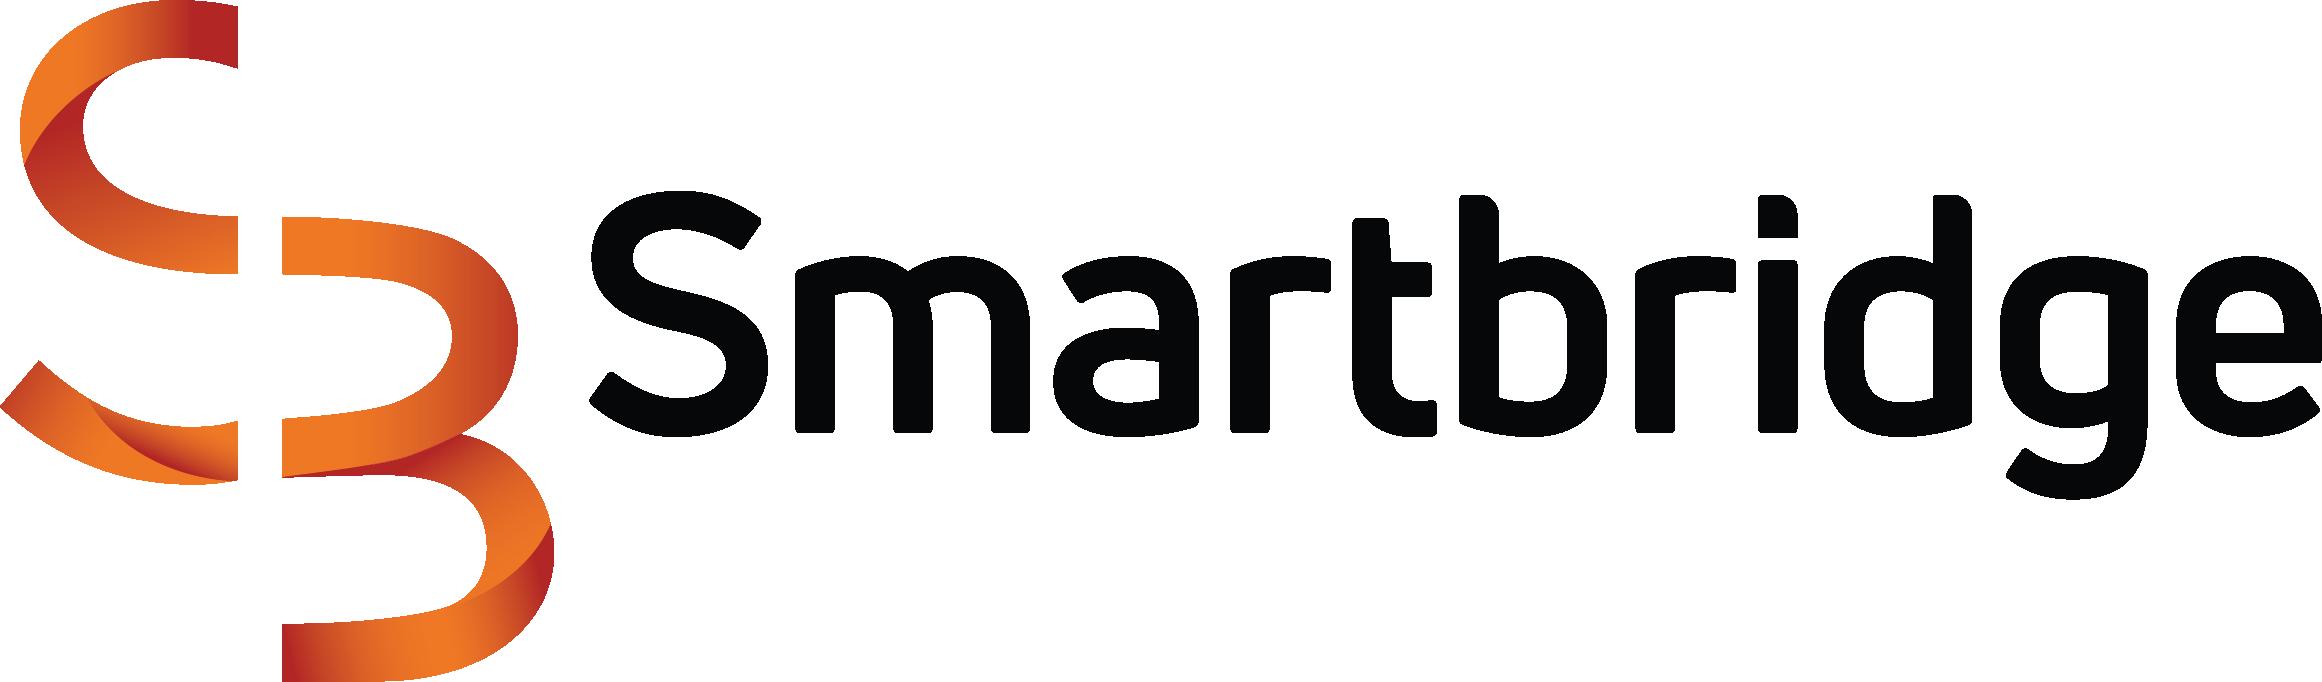 Marketing Coordinator job in Houston - Smartbridge